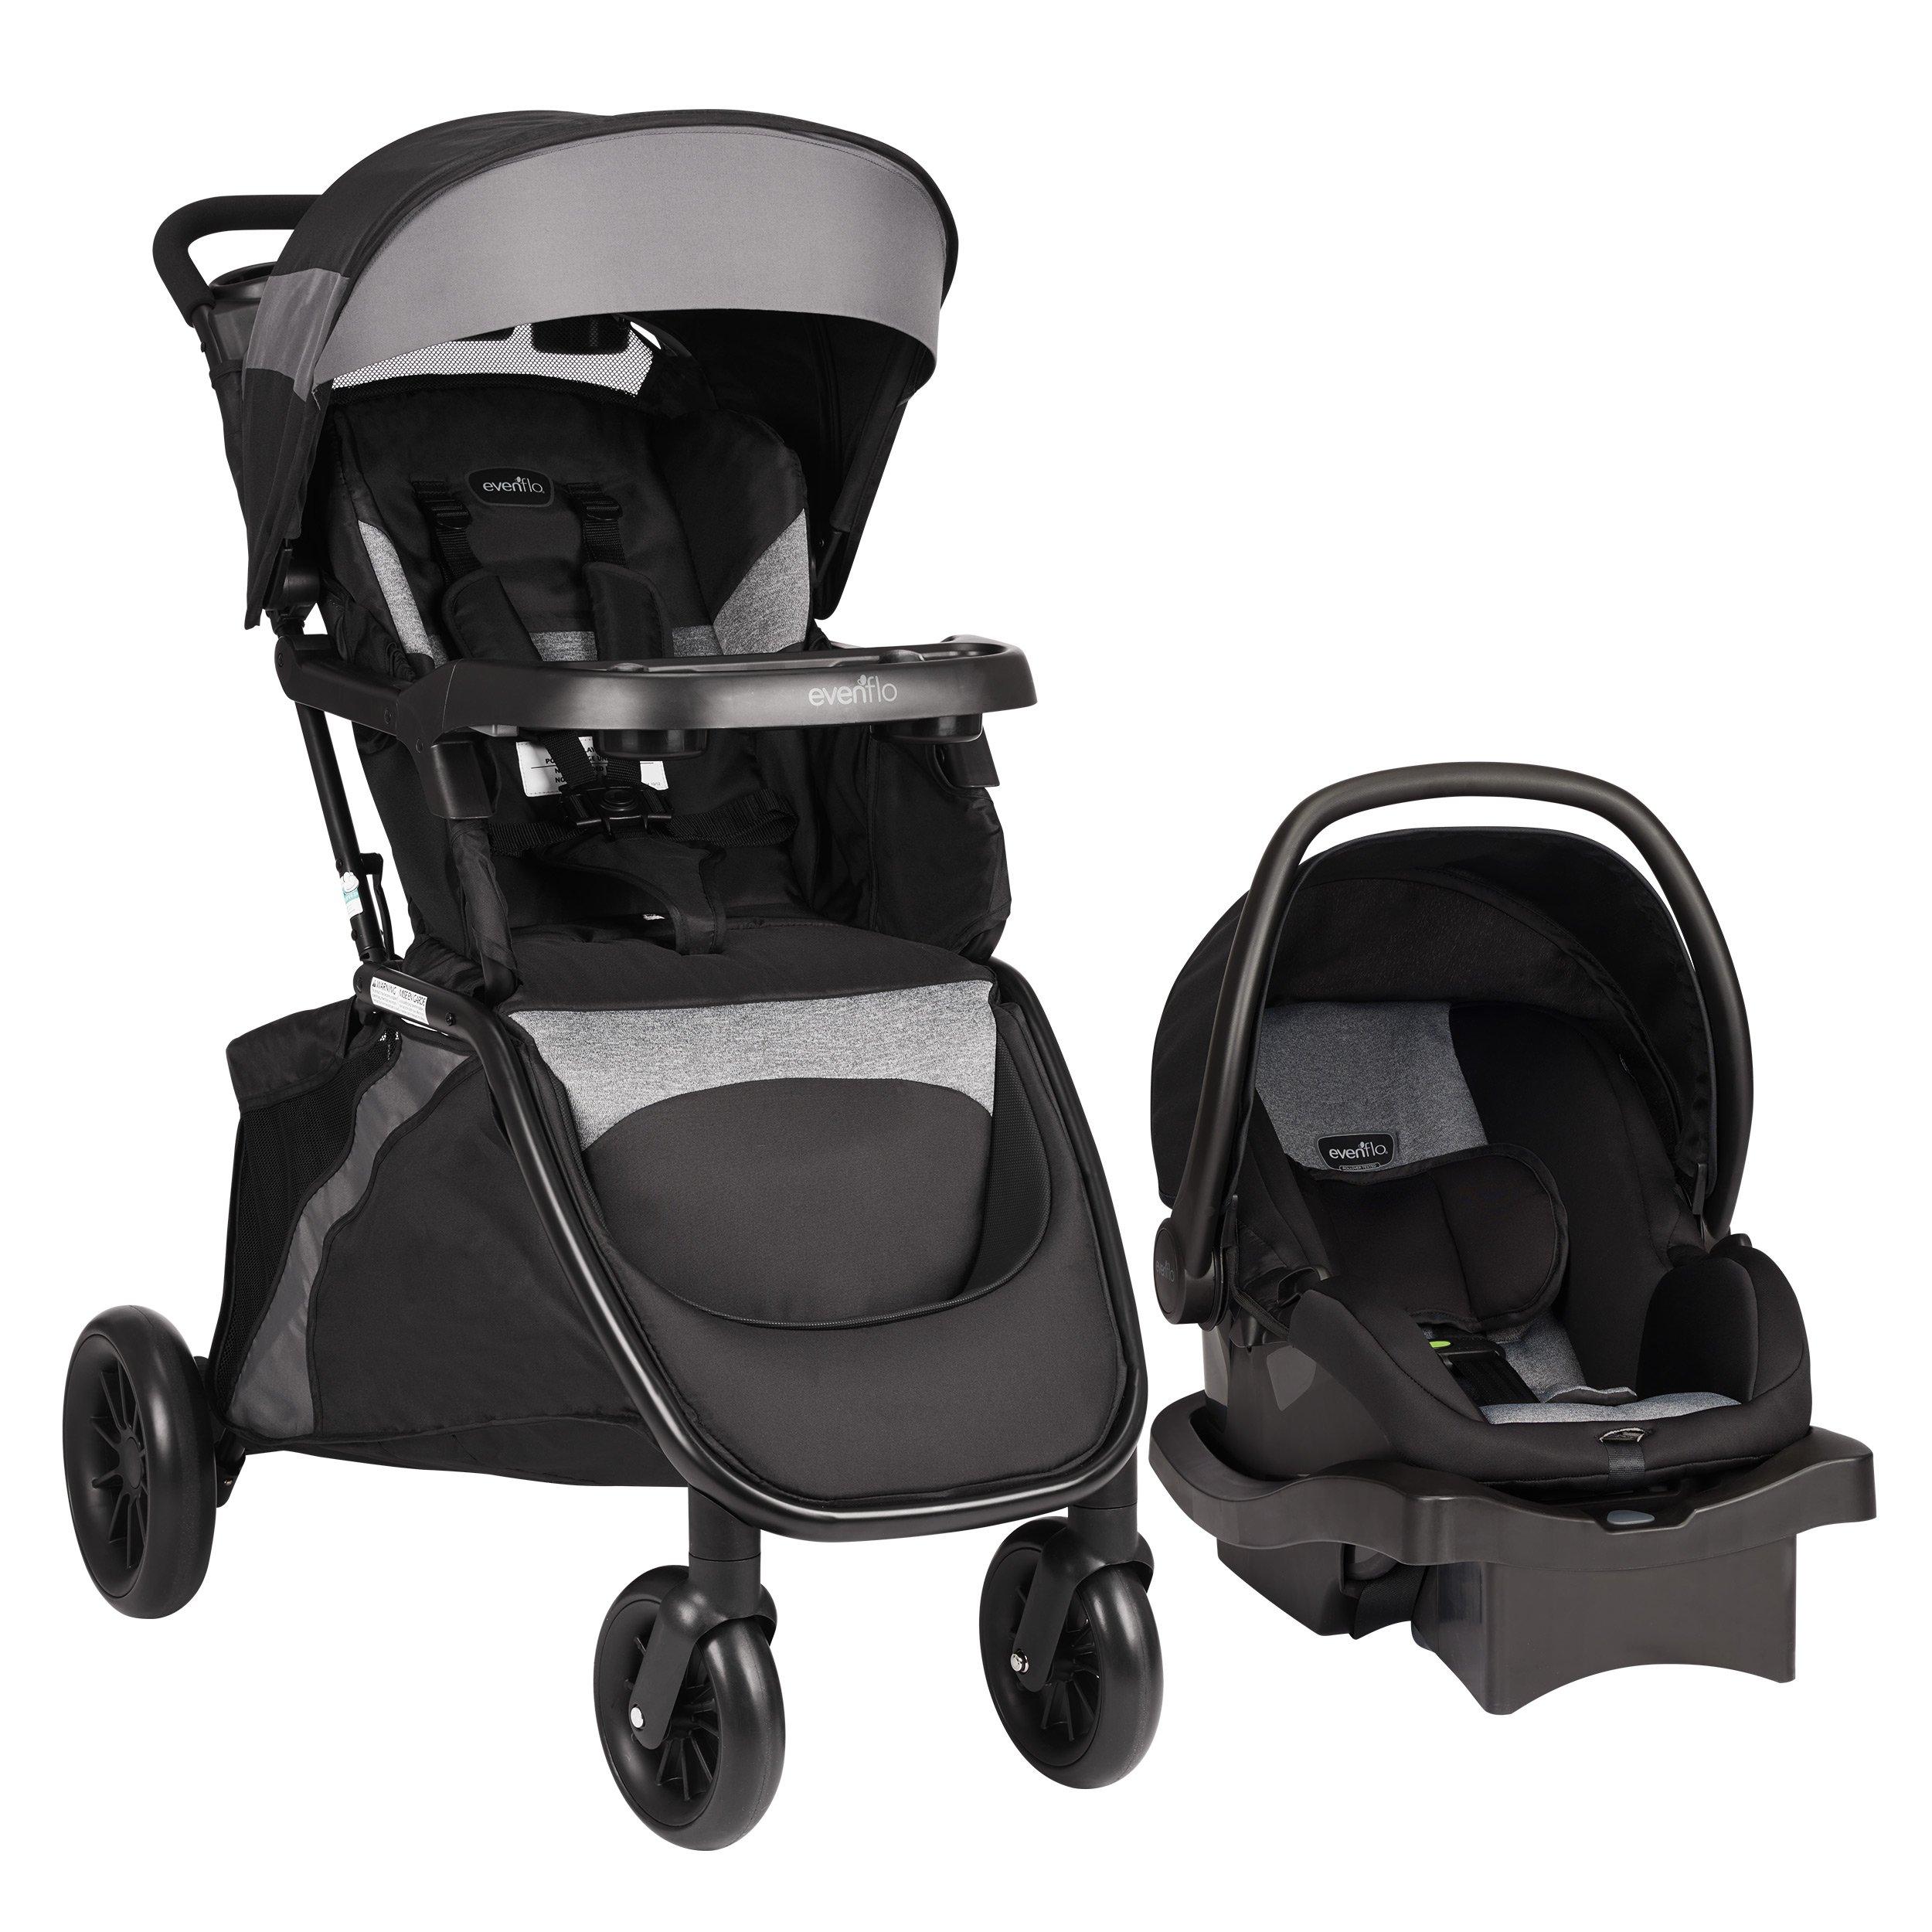 Evenflo Advanced SensorSafe Epic Travel System with LiteMax Infant Car Seat, Jet by Evenflo